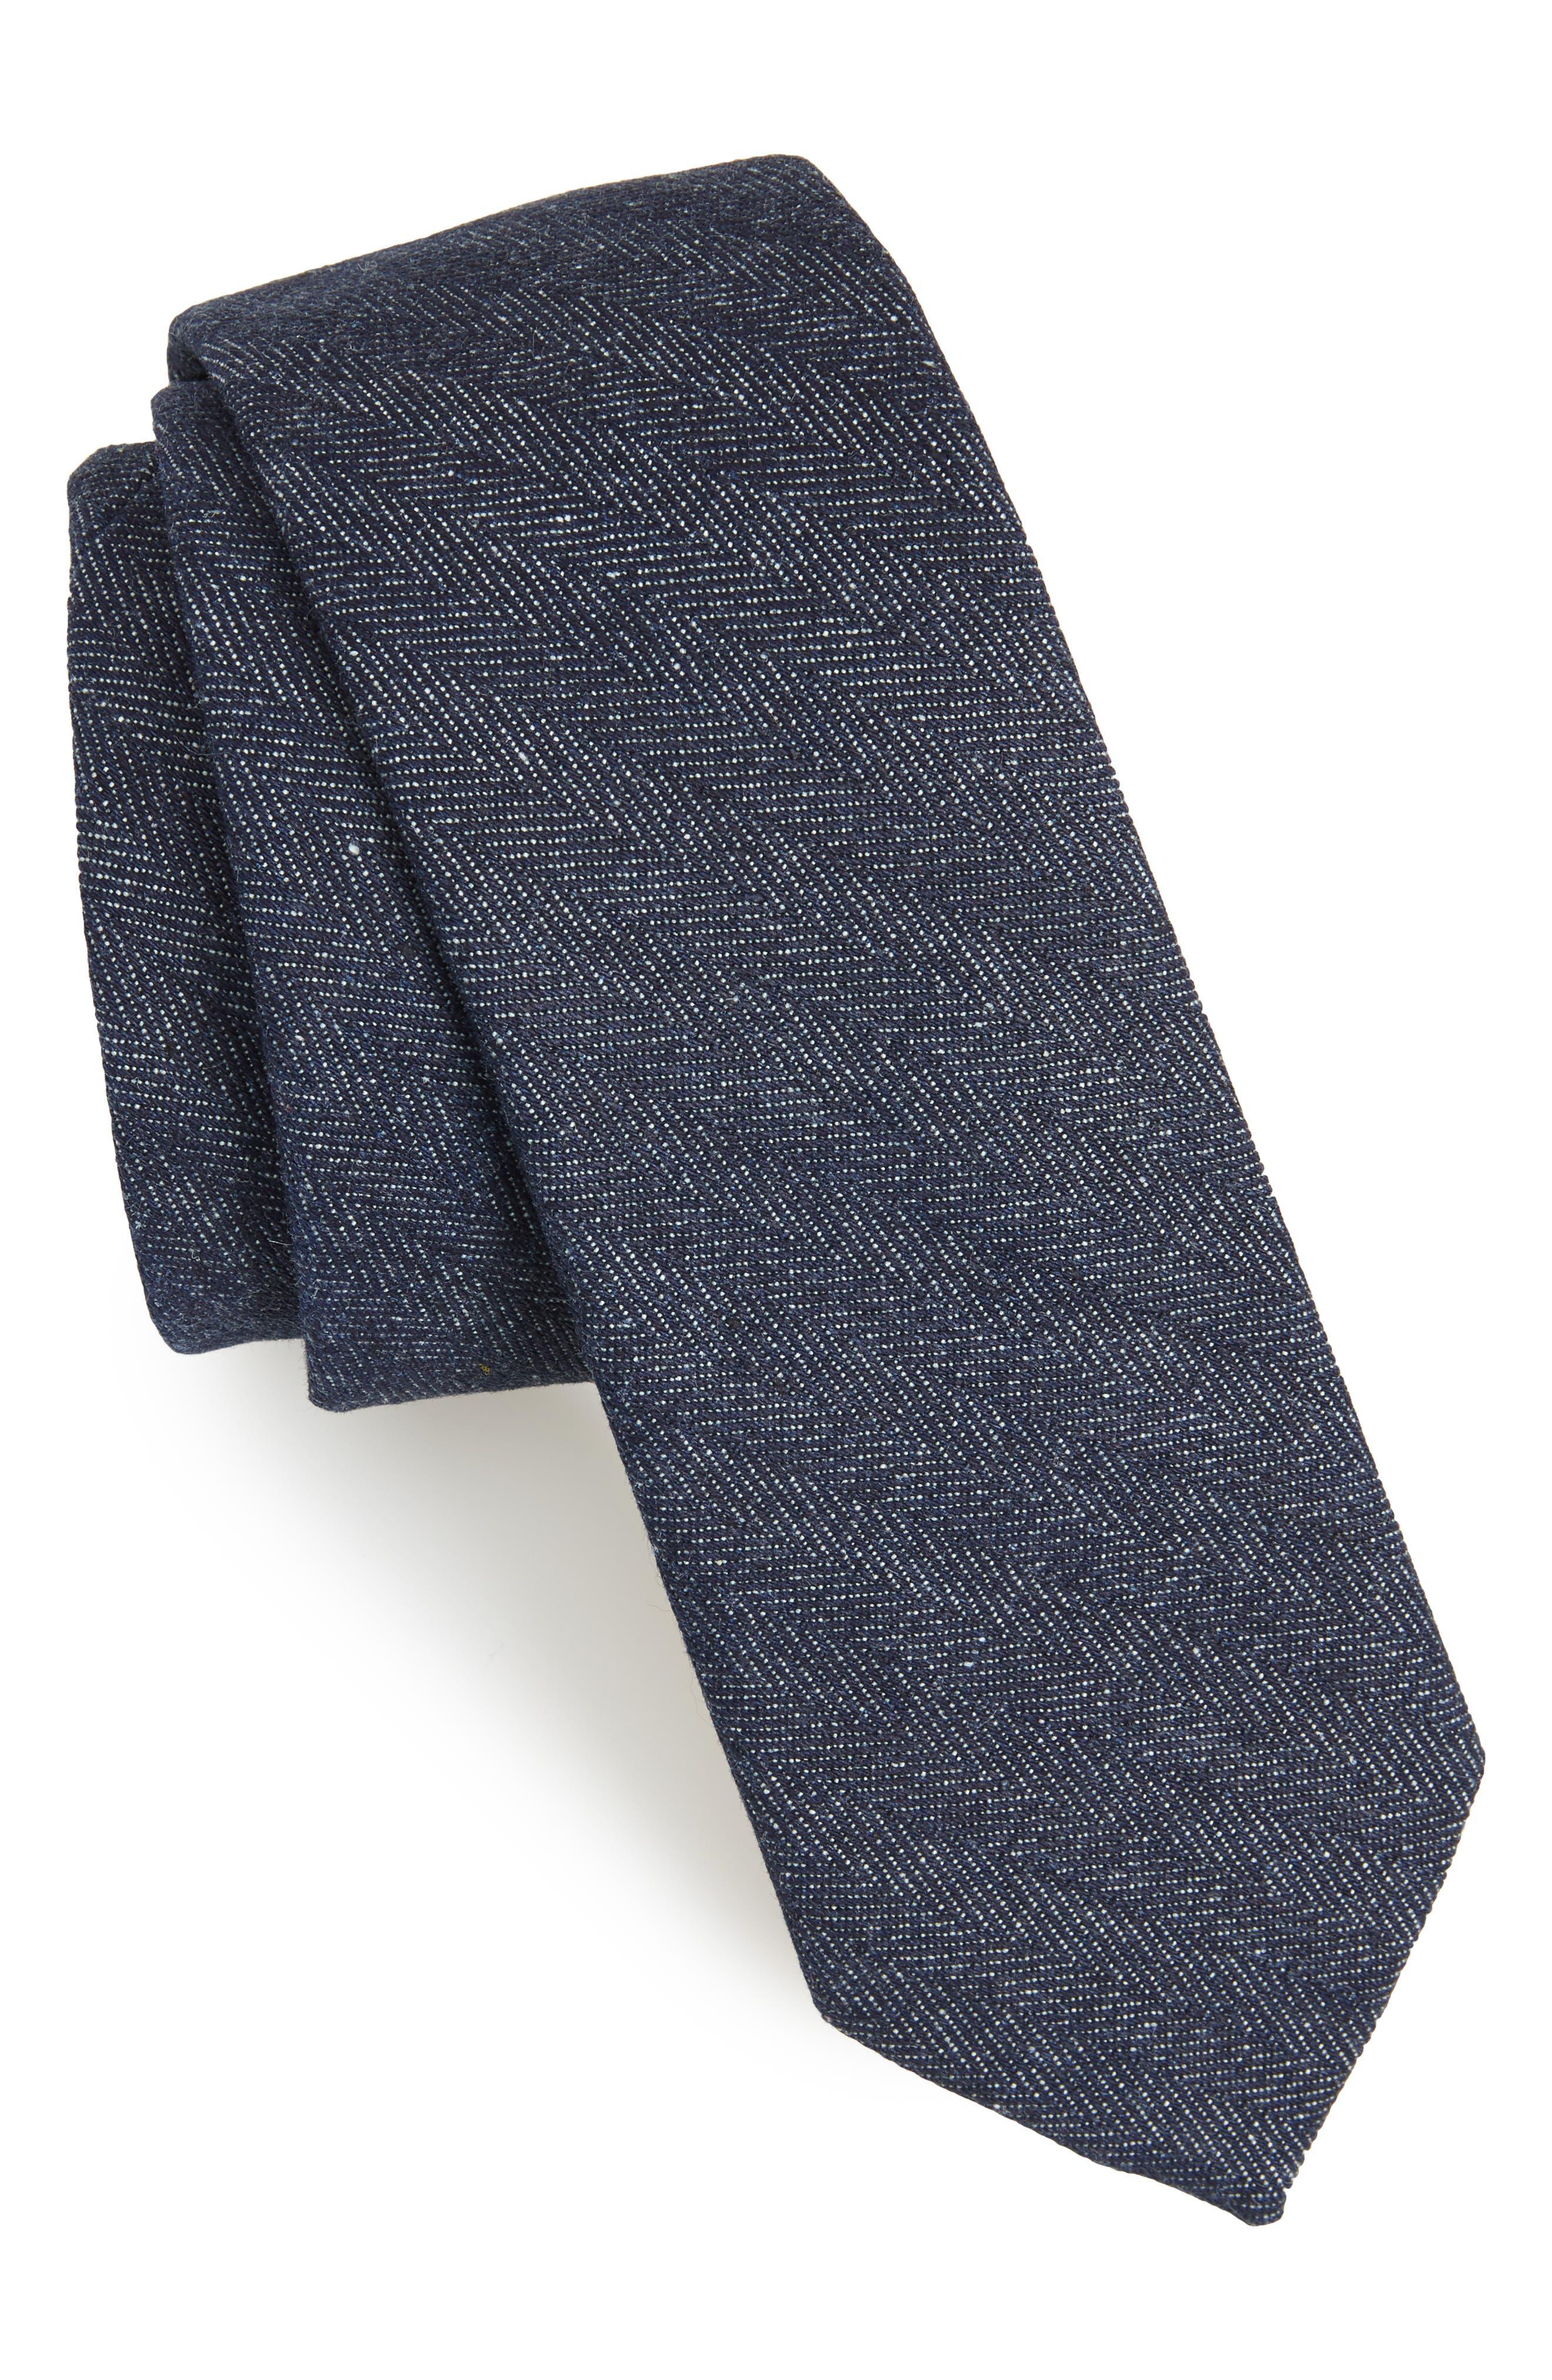 Alternate Image 1 Selected - 1901 Thames Solid Skinny Tie